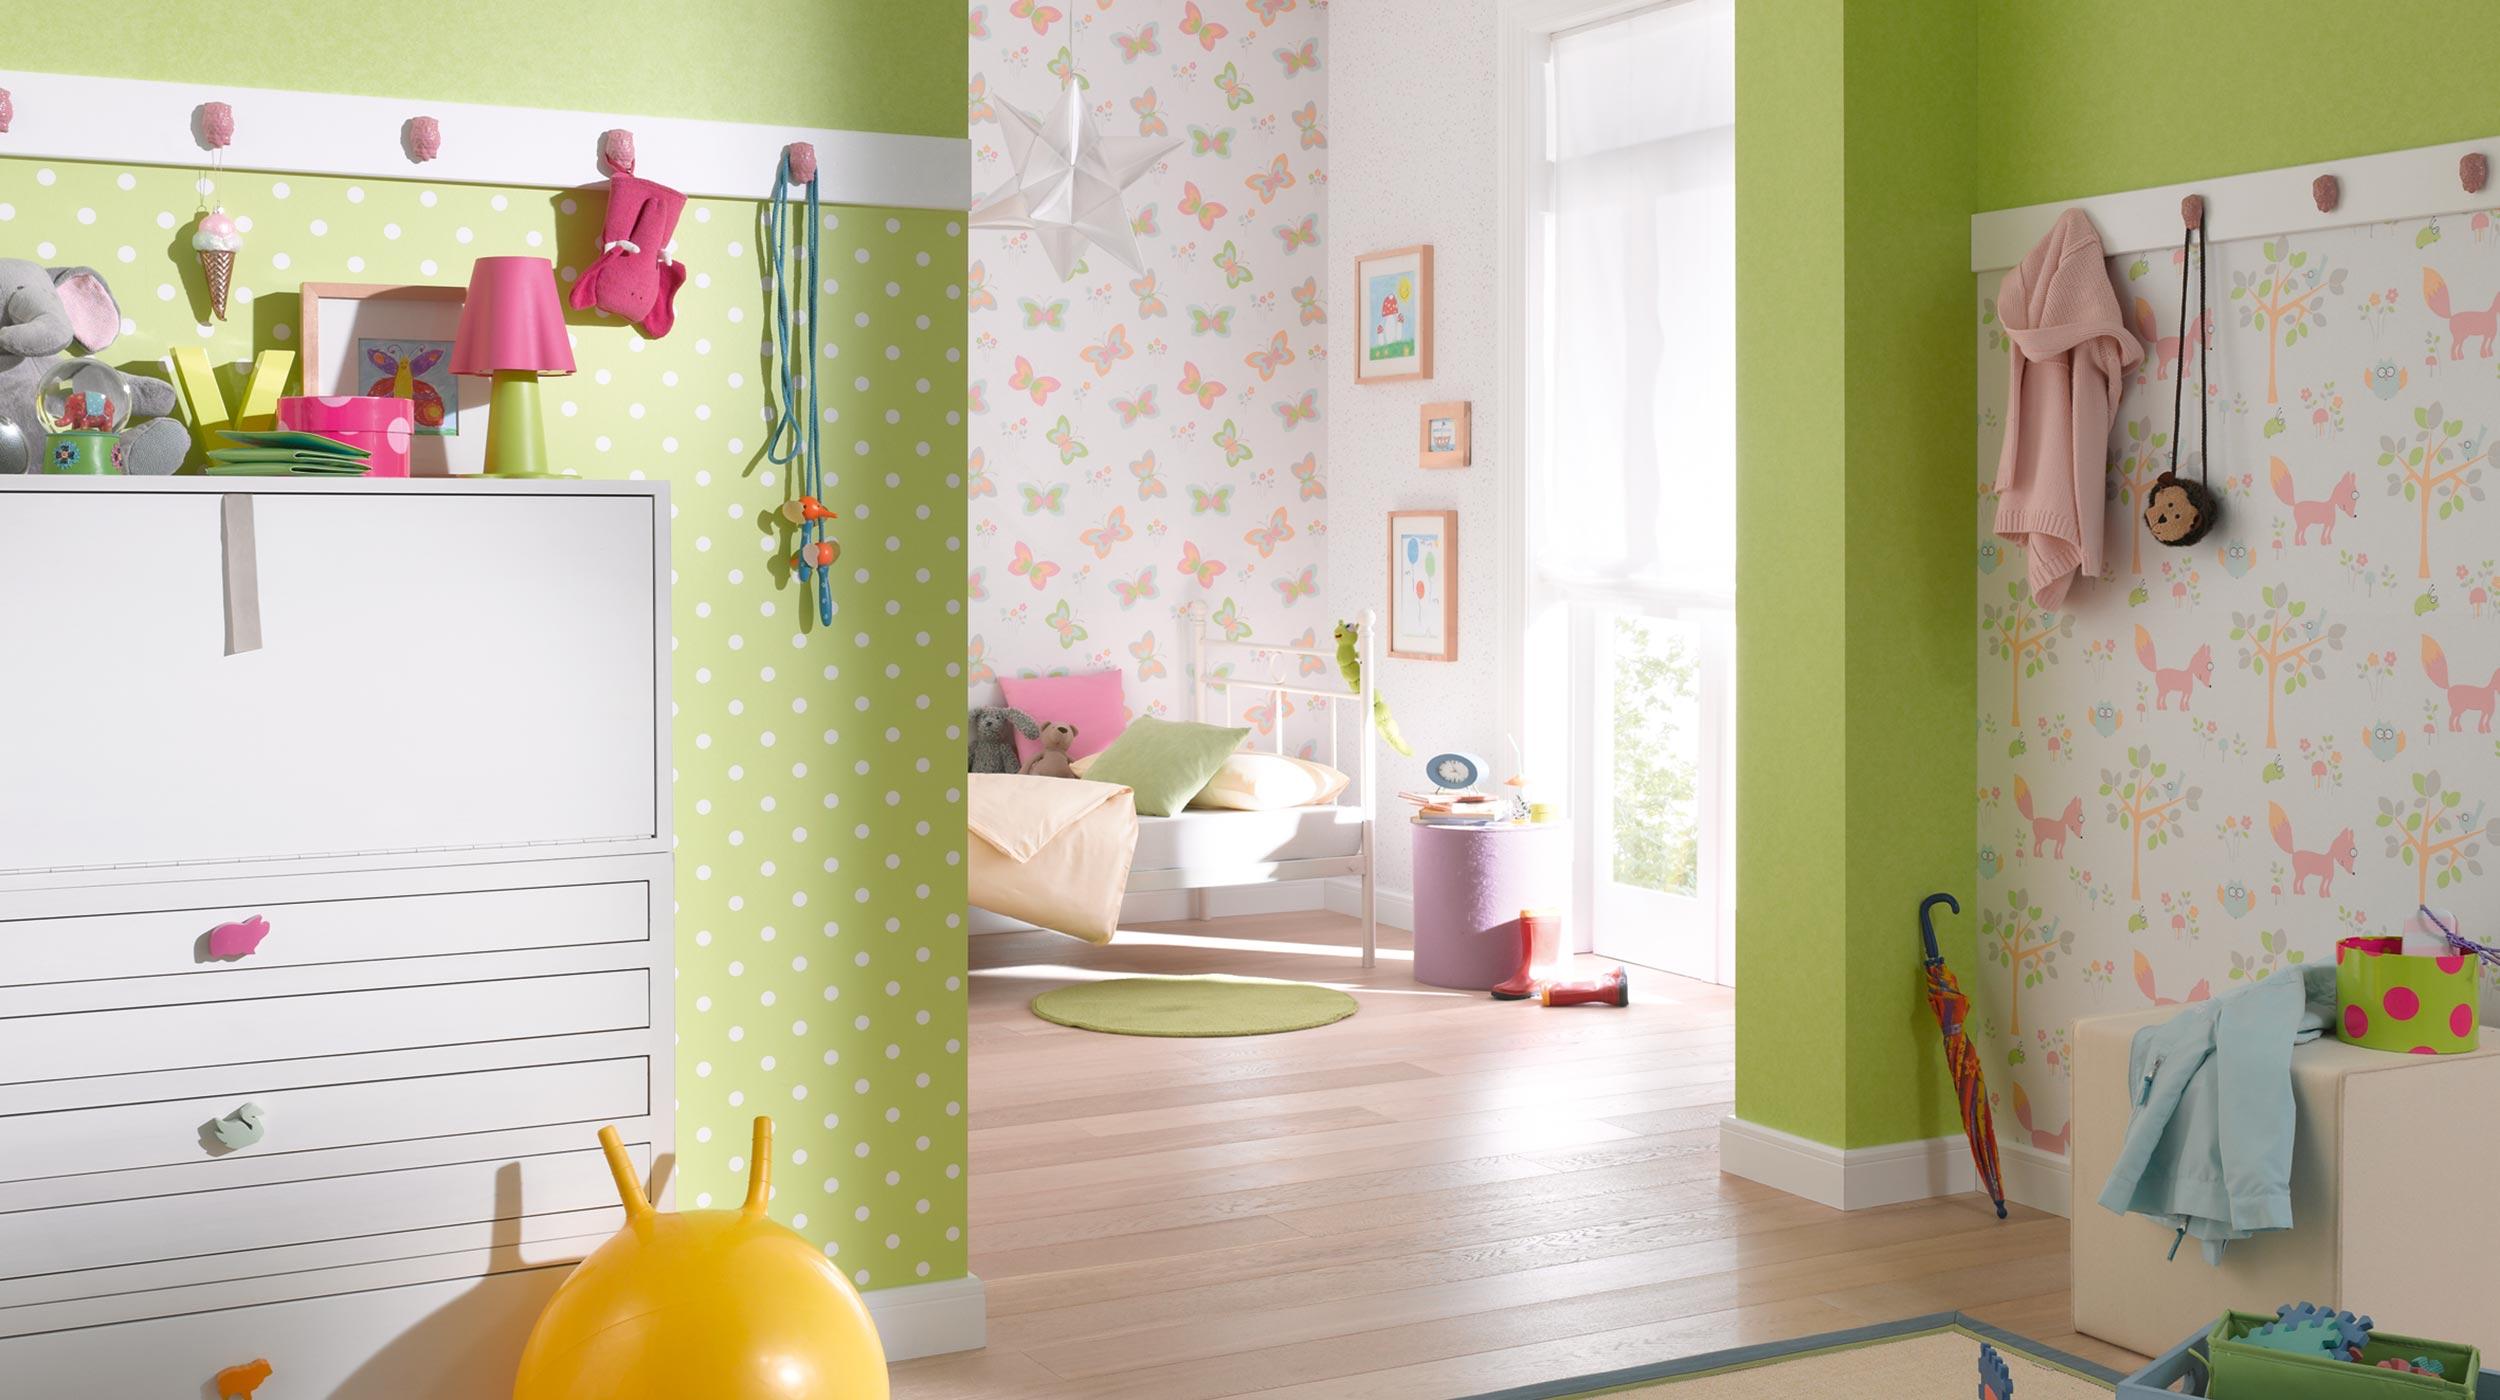 fantasia retro tapeten erismann 10 jpg erismann cie gmbh. Black Bedroom Furniture Sets. Home Design Ideas